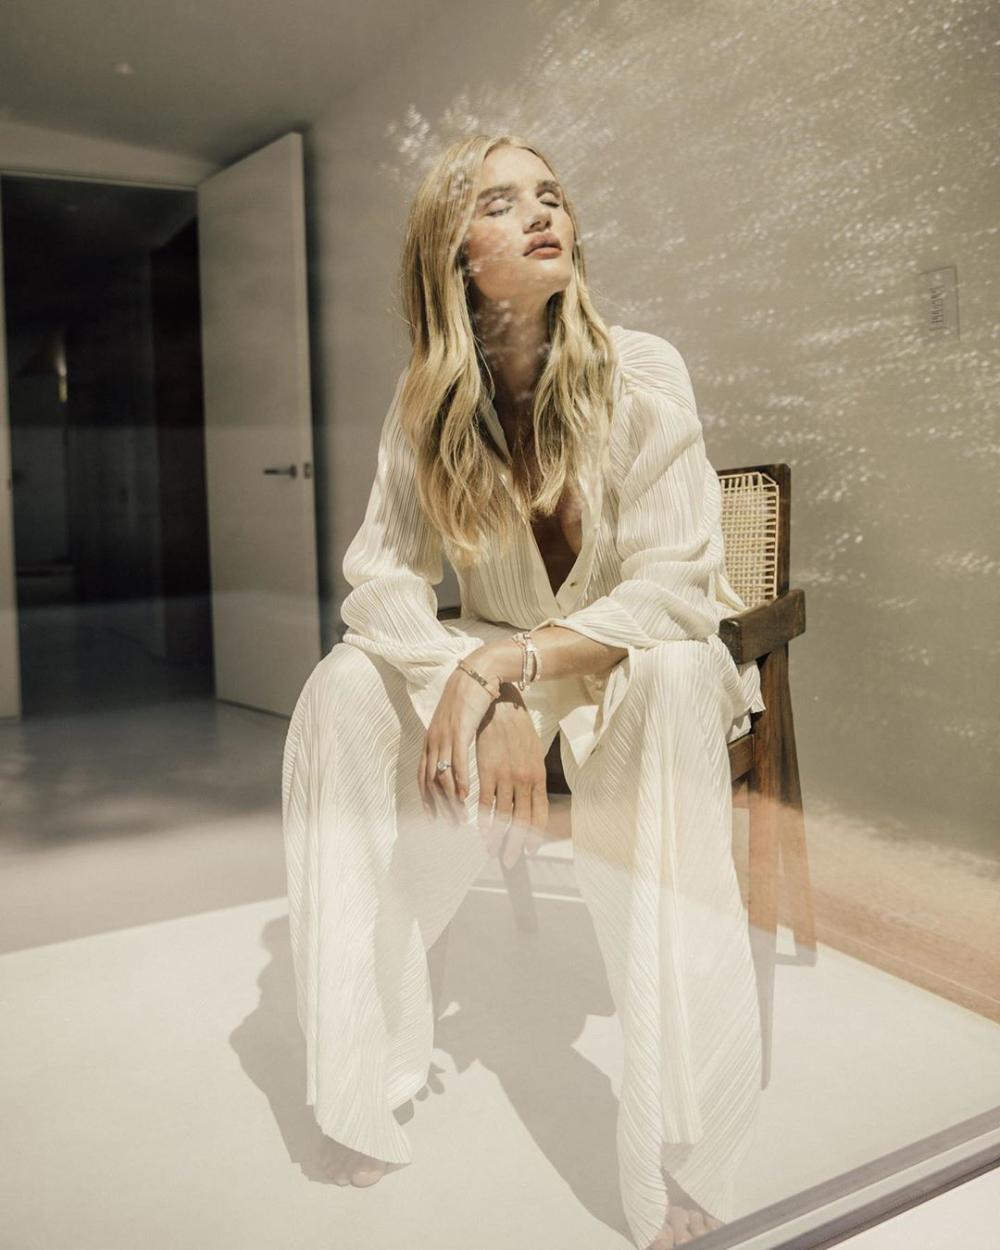 Fashion style: αυτό είναι το trend που έχουν λατρέψει φέτος οι γυναίκες της μόδας ! Rosie Huntington Whiteley